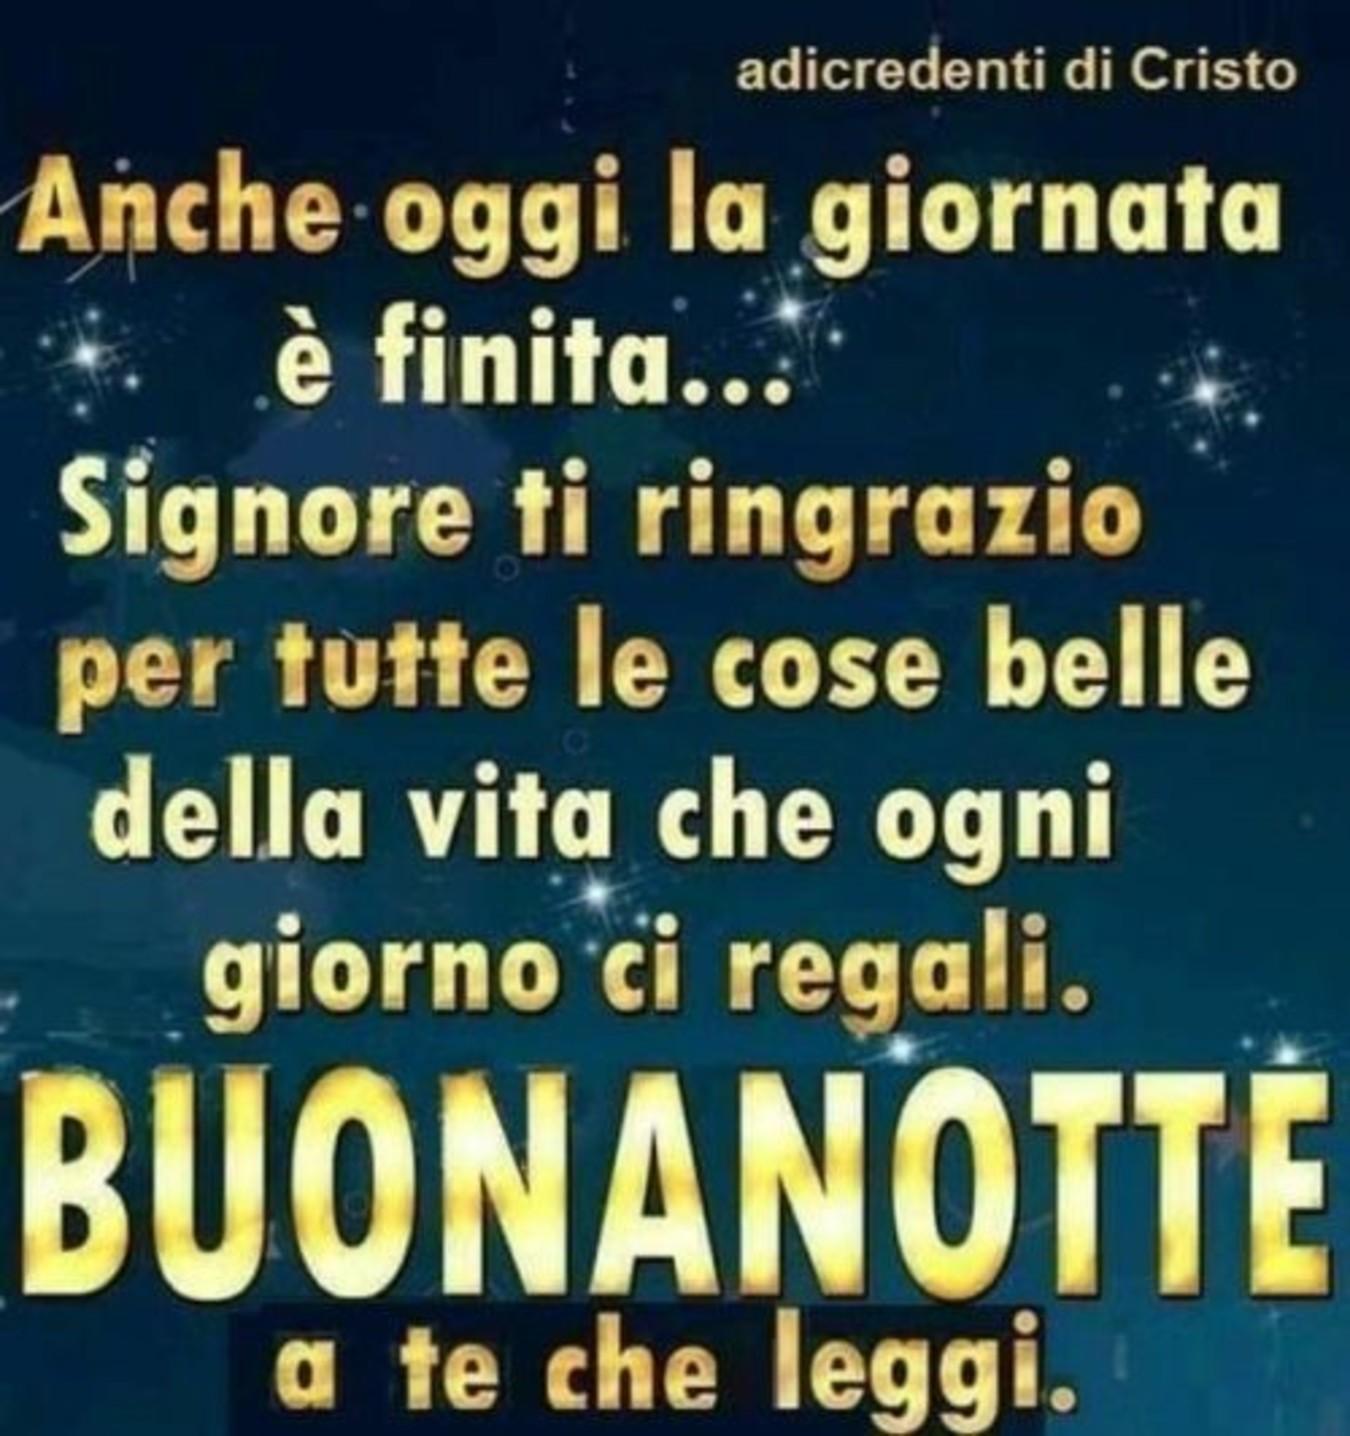 Immagini Buonanotte Belle Gratis Per Whatsapp 6141 Immaginifacebookit